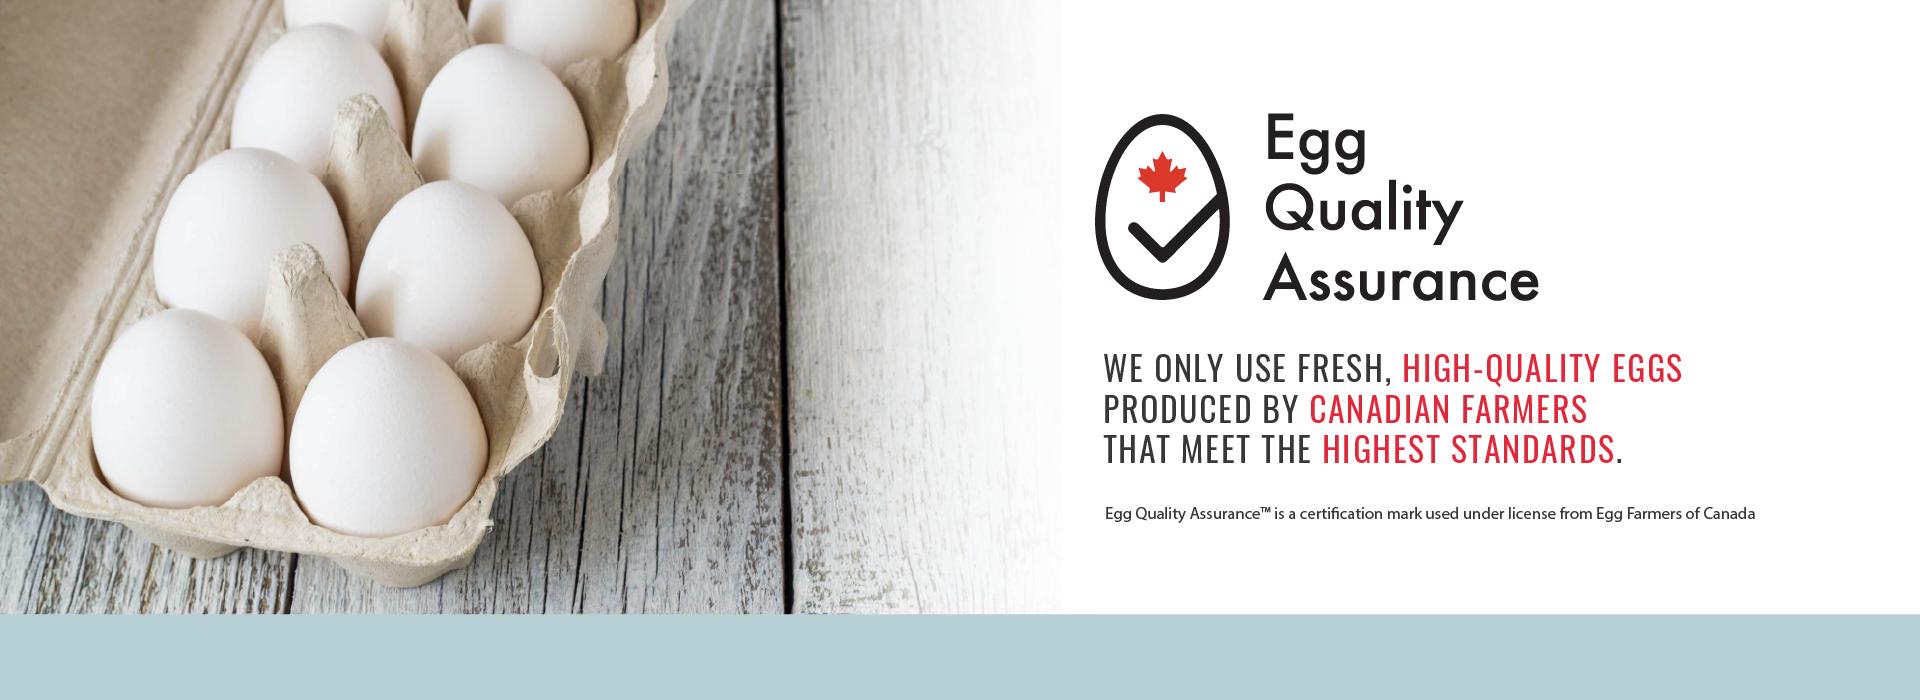 Egg Quality Assurance™